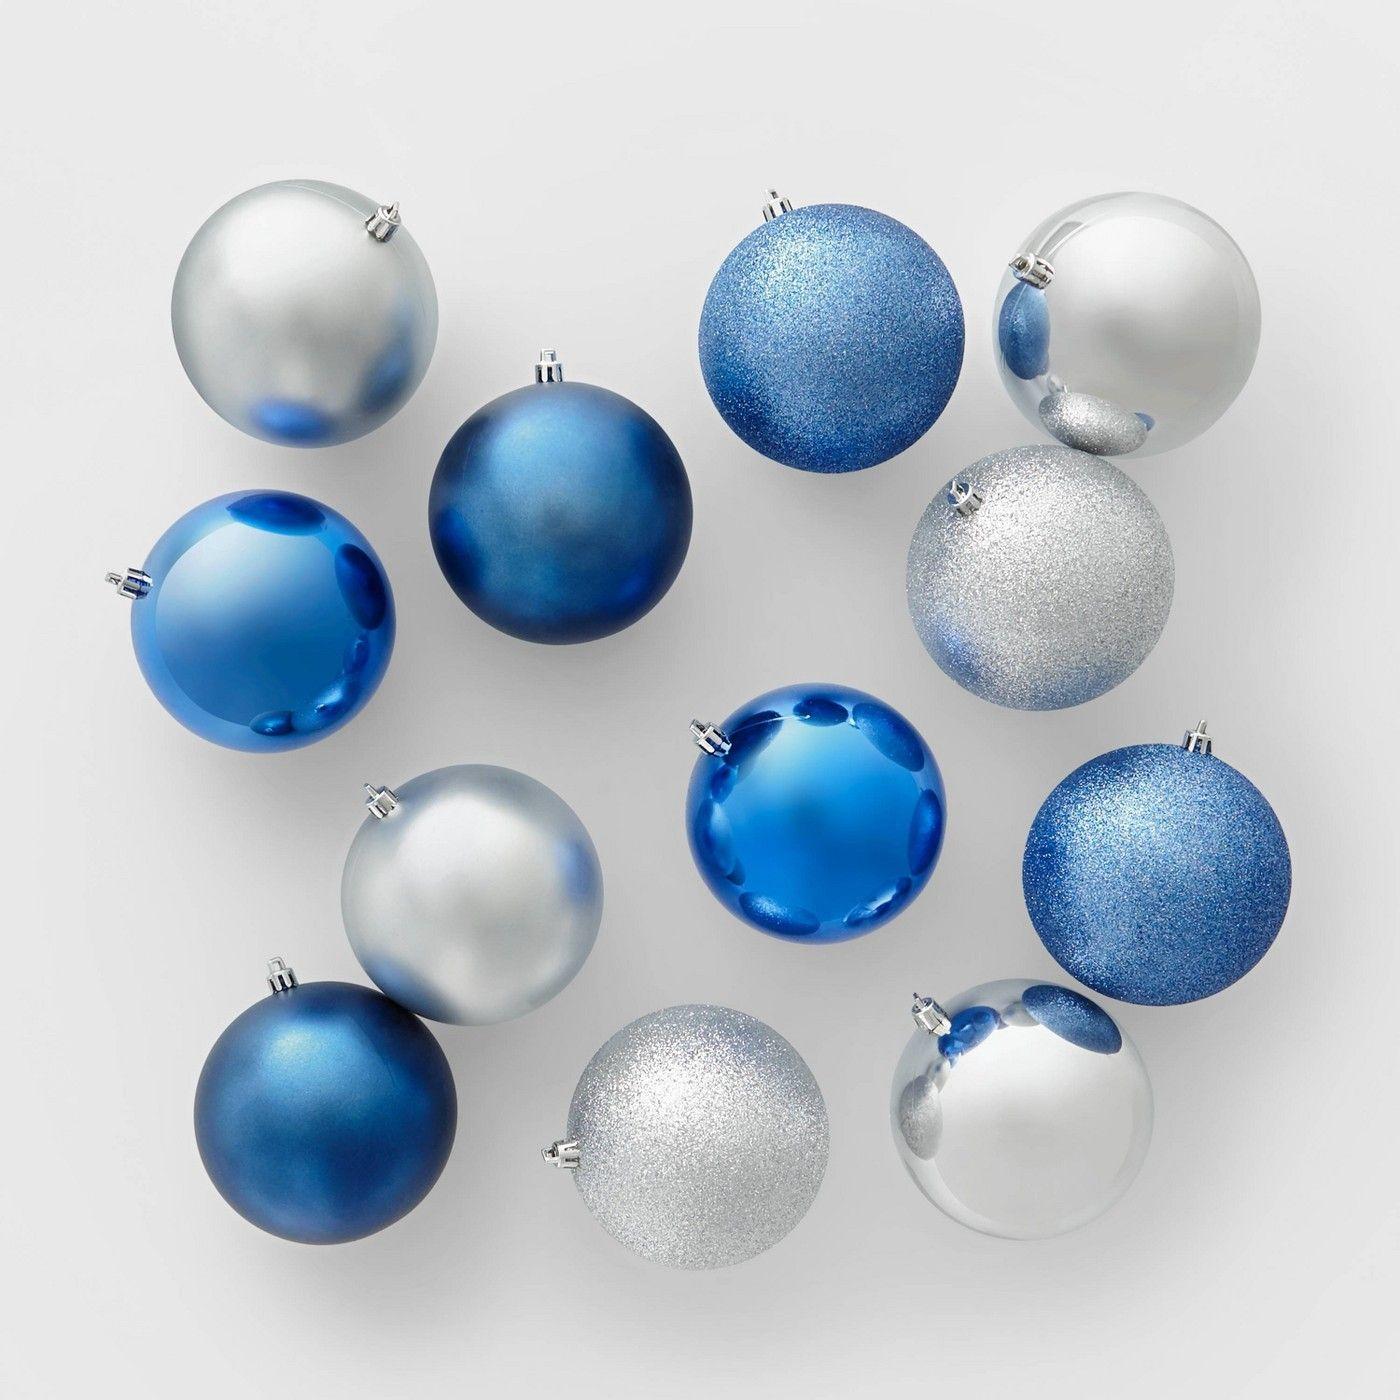 12ct 100mm Shatter Resistant Christmas Ornament Set Dark Blue Silver Wondershop Affiliate Mm Ad Christmas Ornament Sets Ornament Set Christmas Ornaments